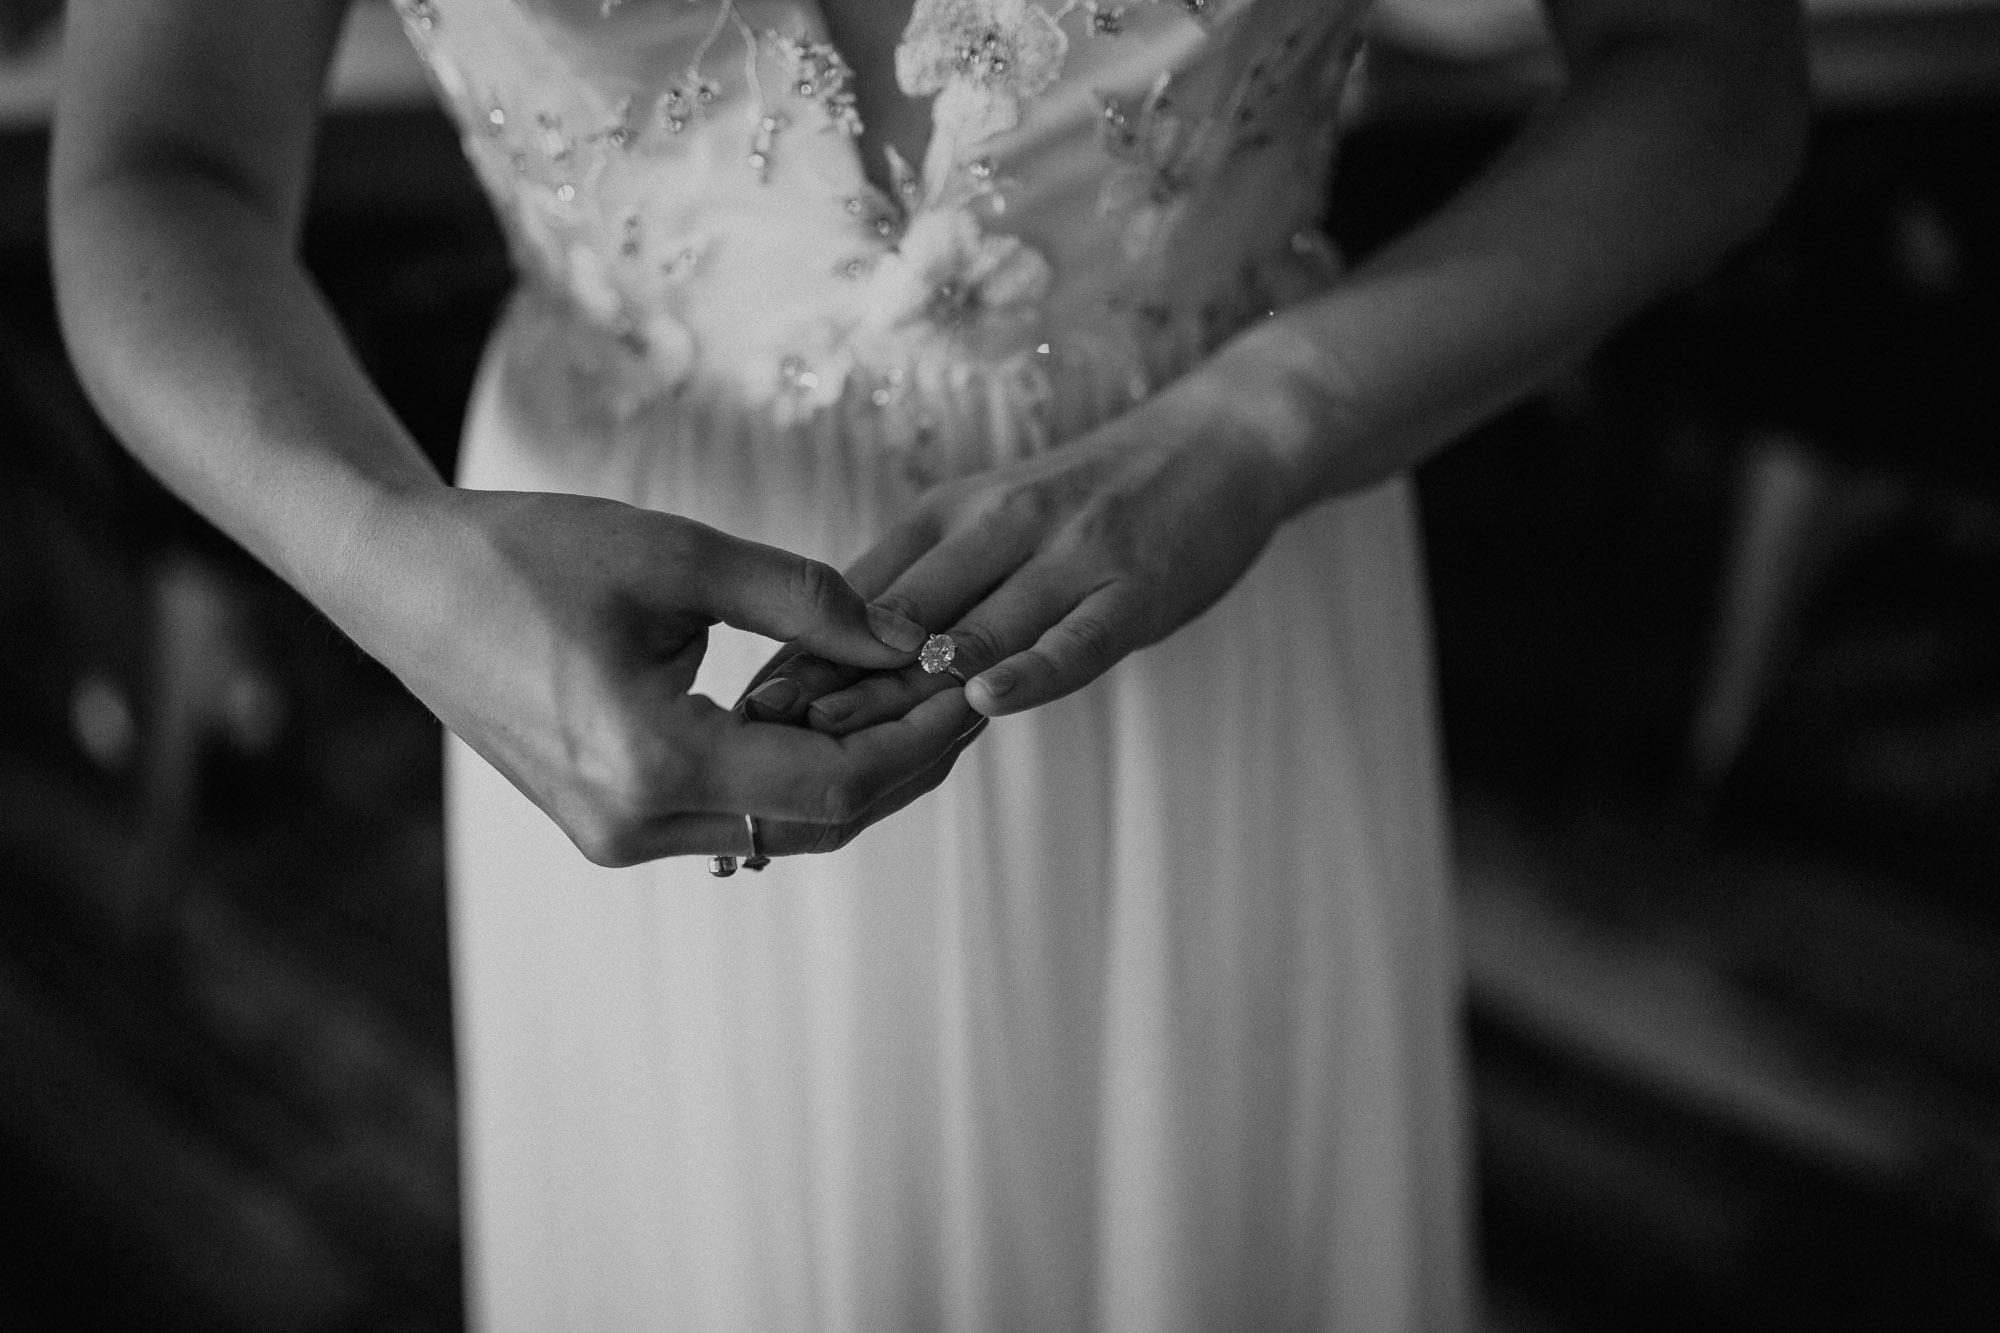 journeyman_distillery_wedding_photographer_chicago_il_wright_photographs-1164.jpg